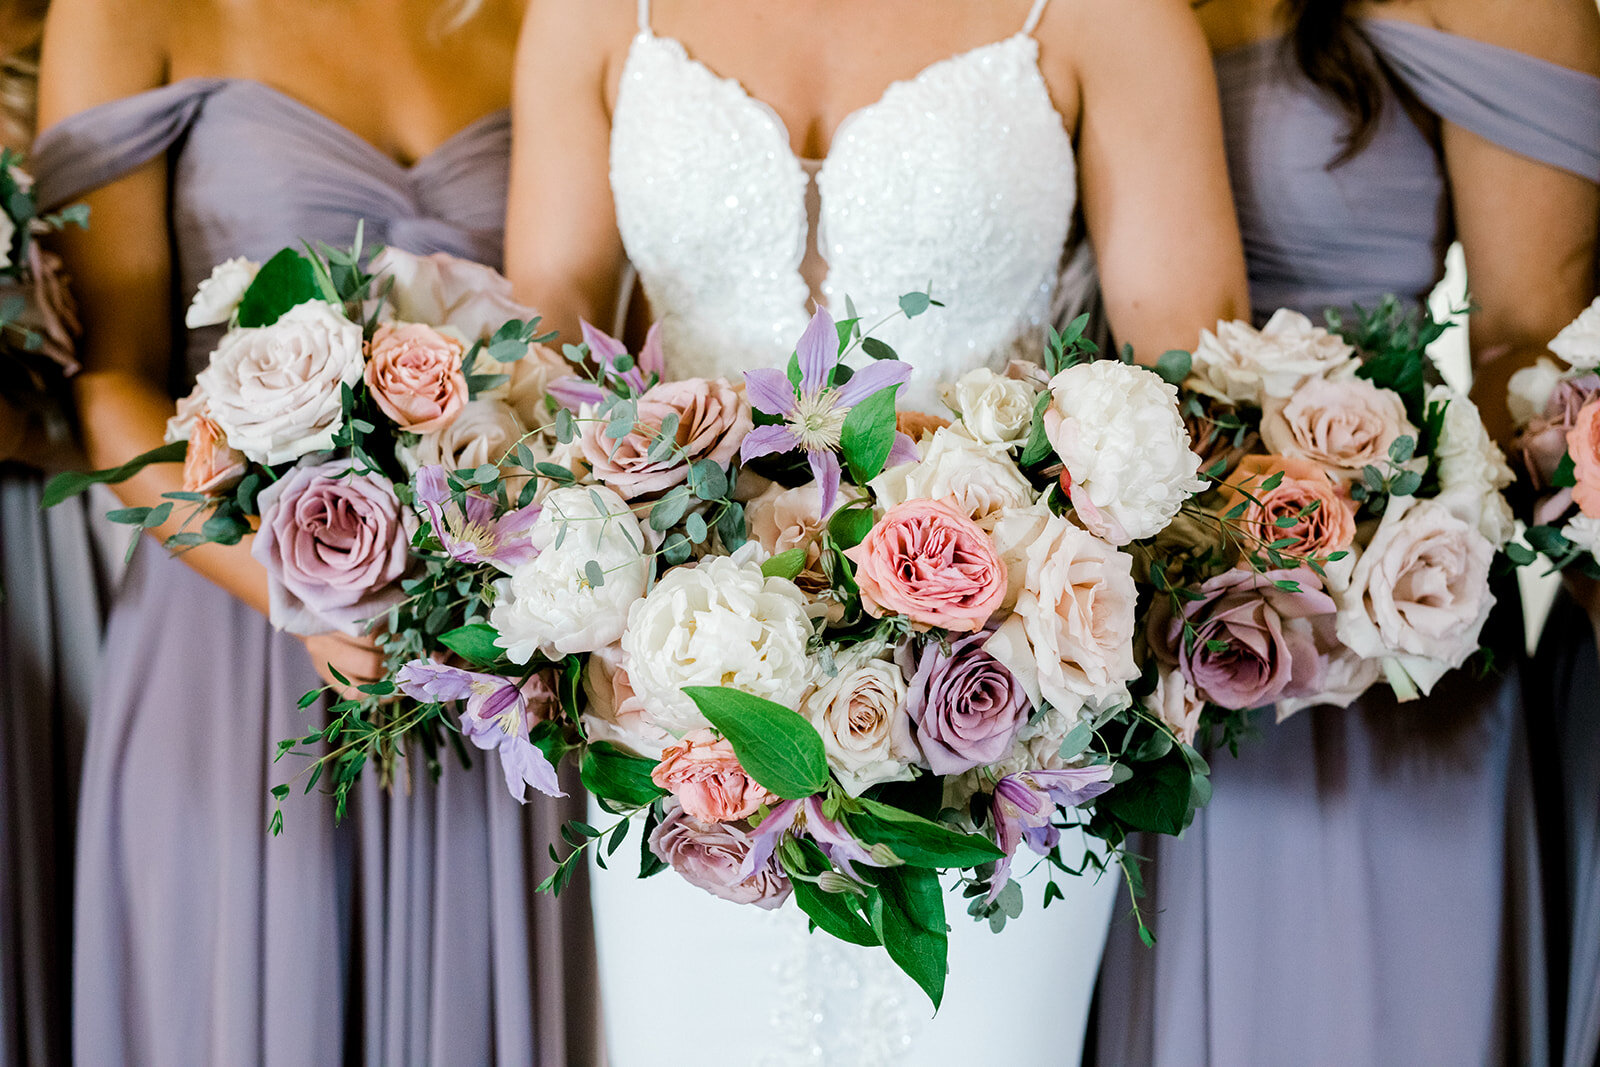 bridesmaisd bouquets.jpg